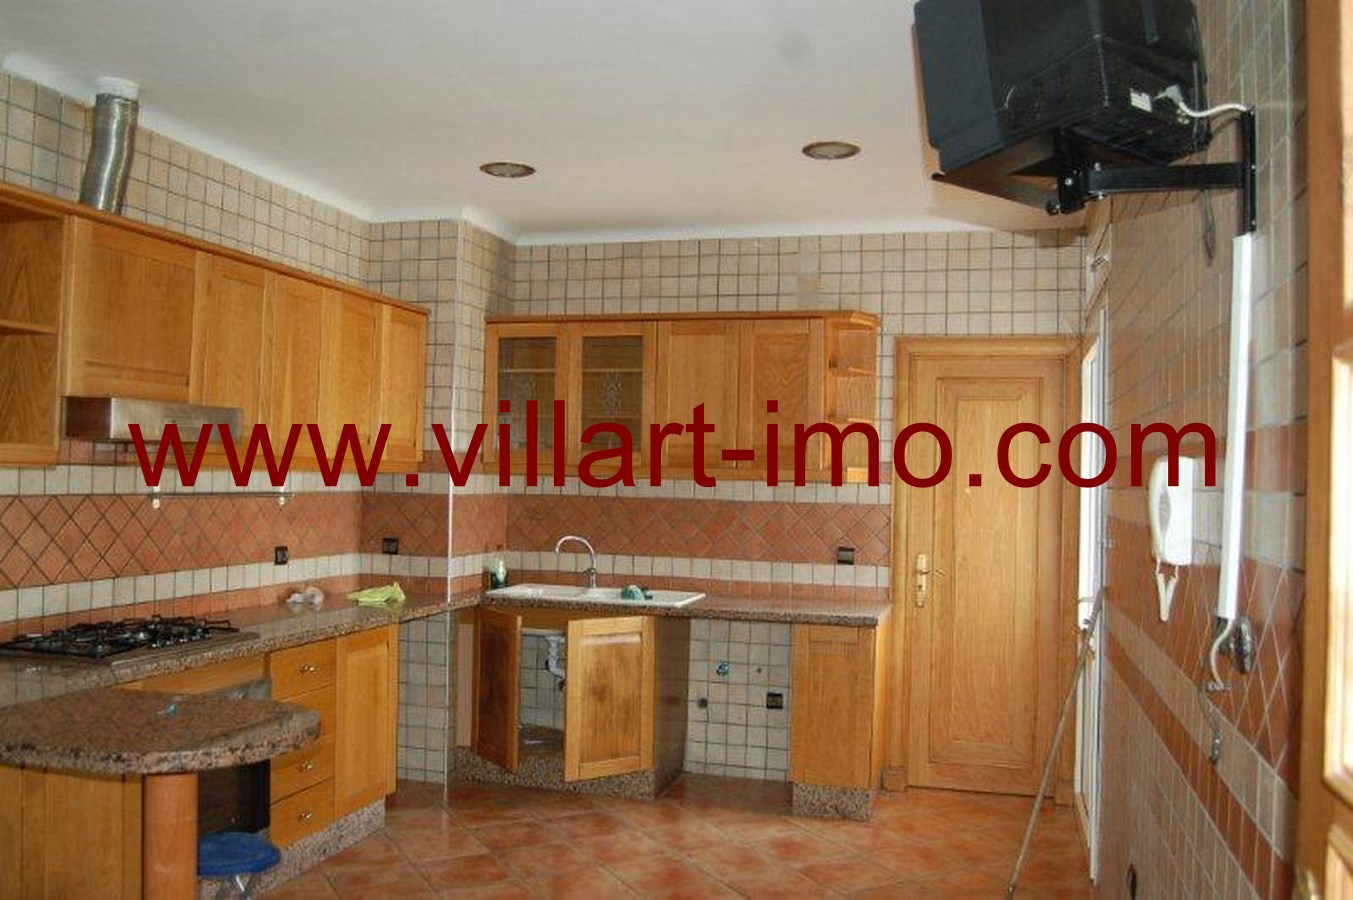 7-Location-Appartement-Non meublé-Tanger-Iberia-Cuisine'-L484-Villart immo